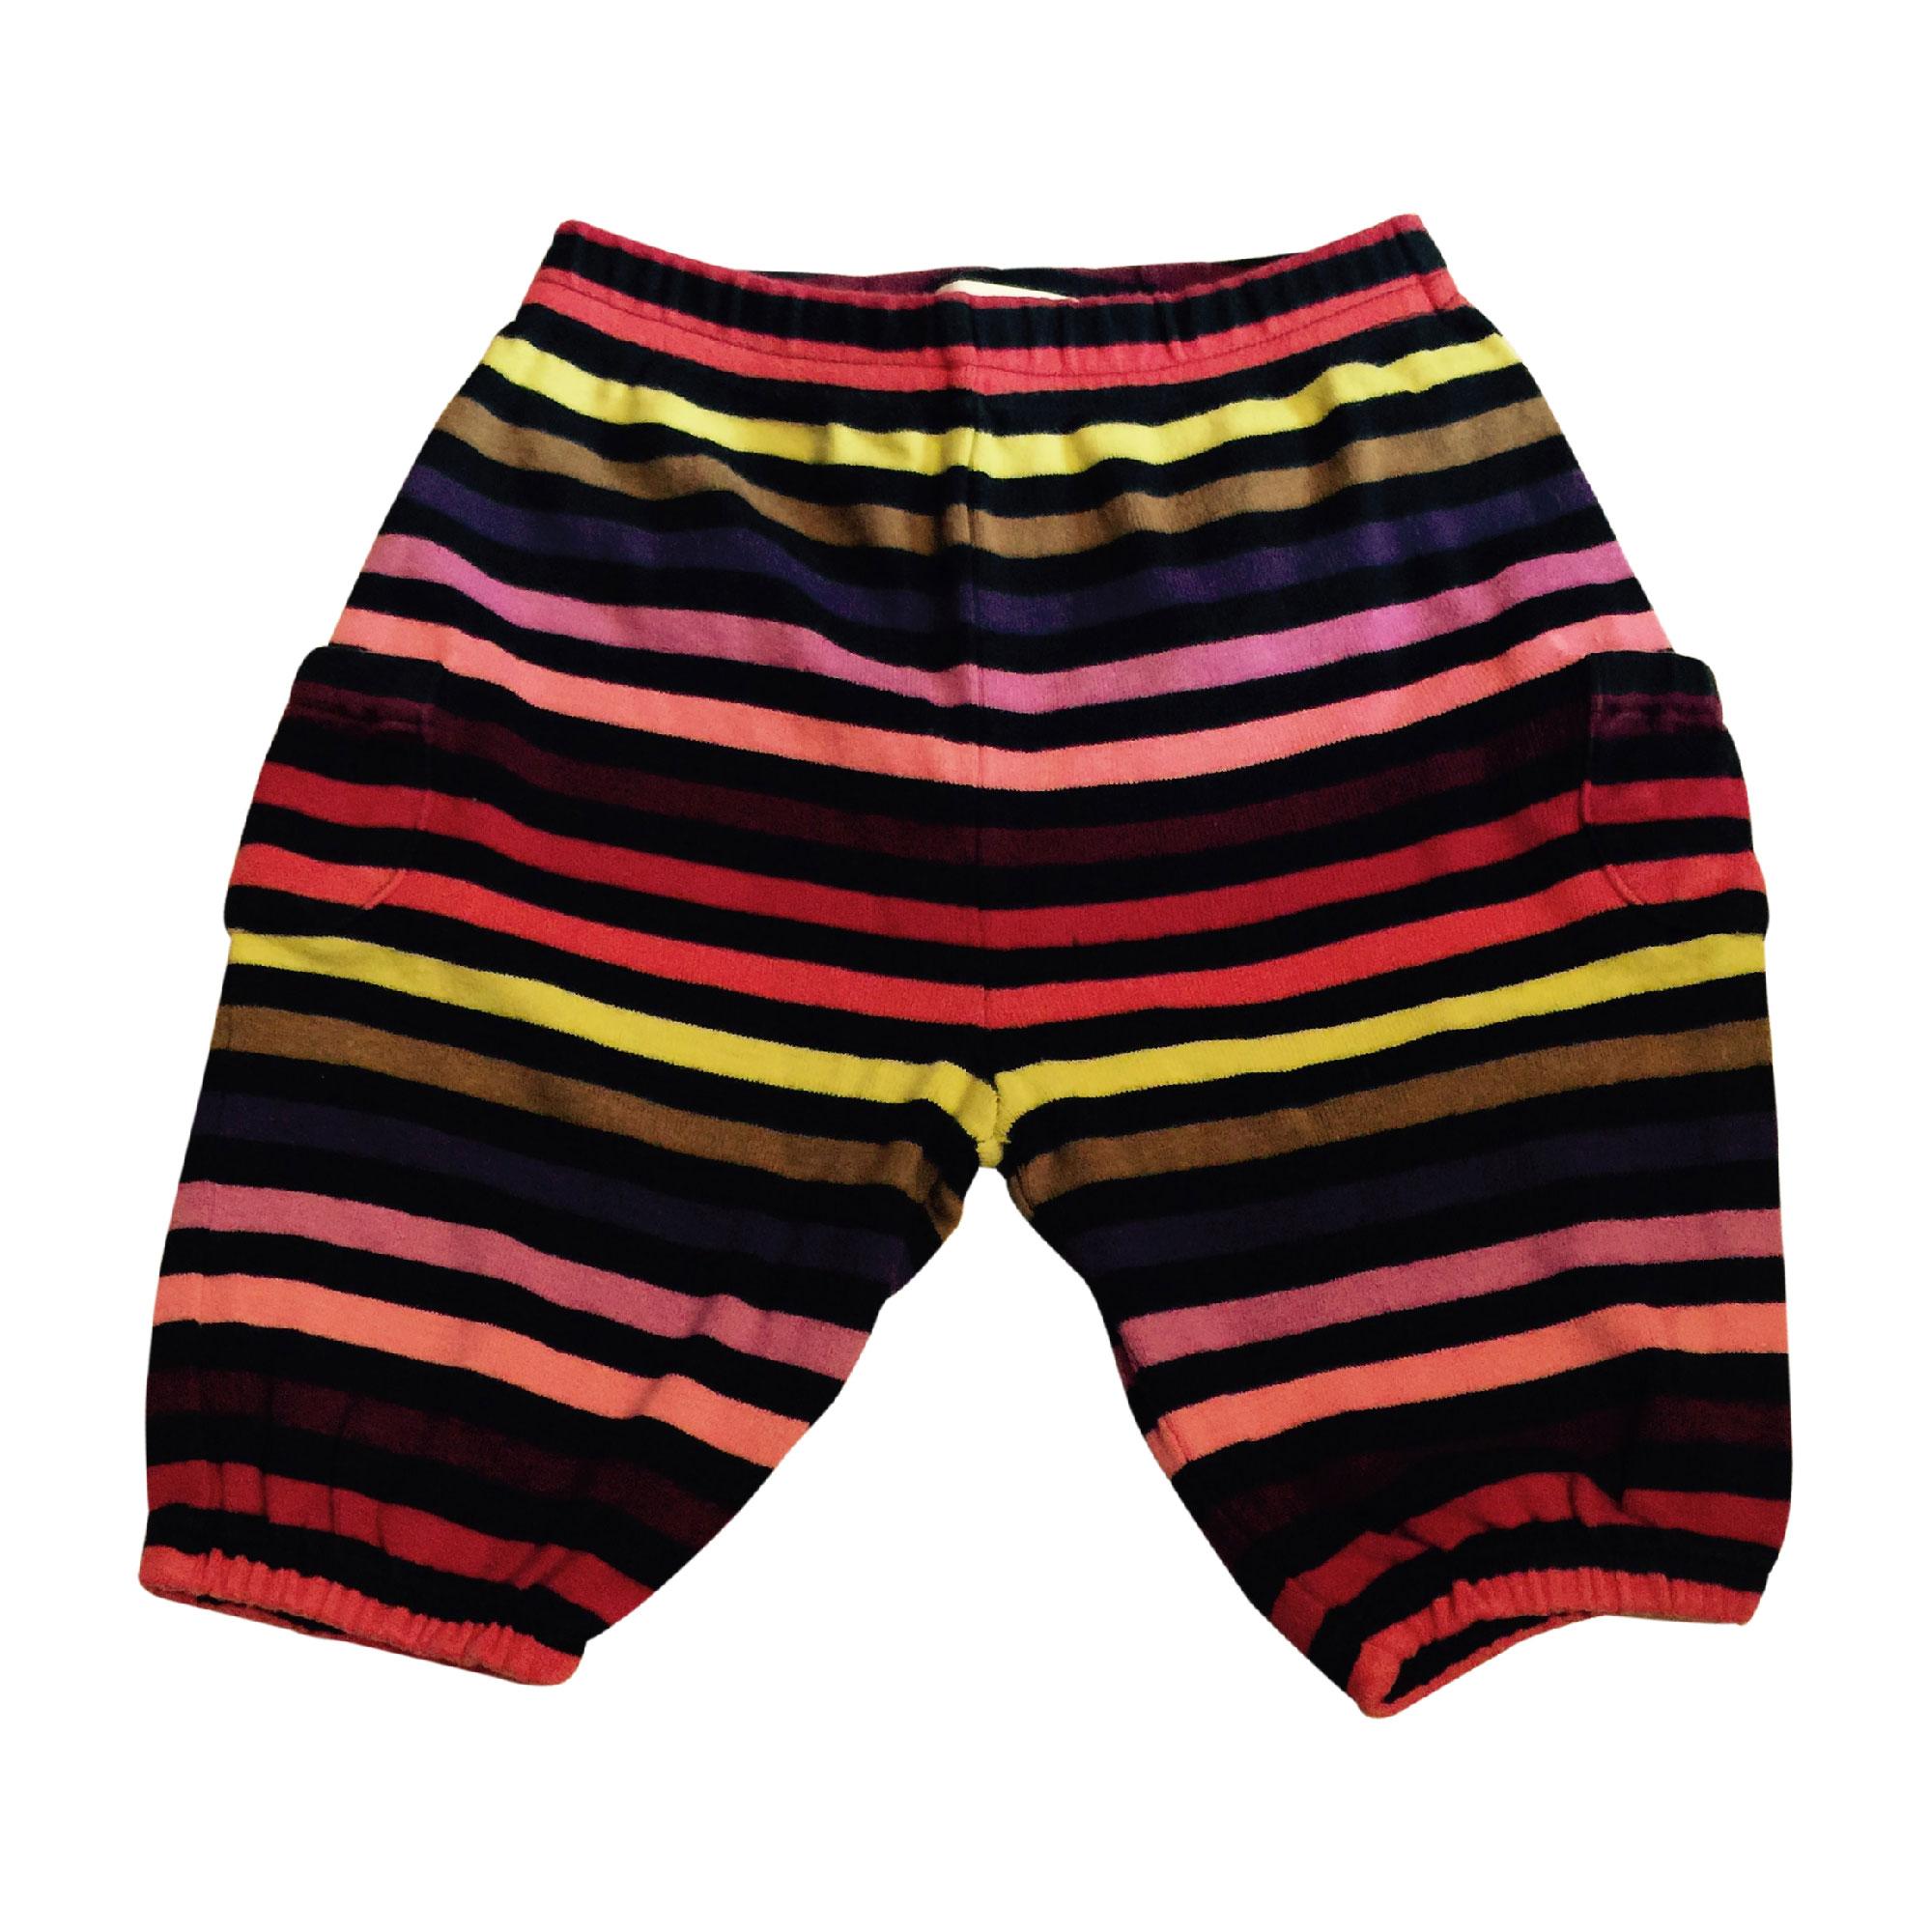 Pantalon SONIA BY SONIA RYKIEL Autre